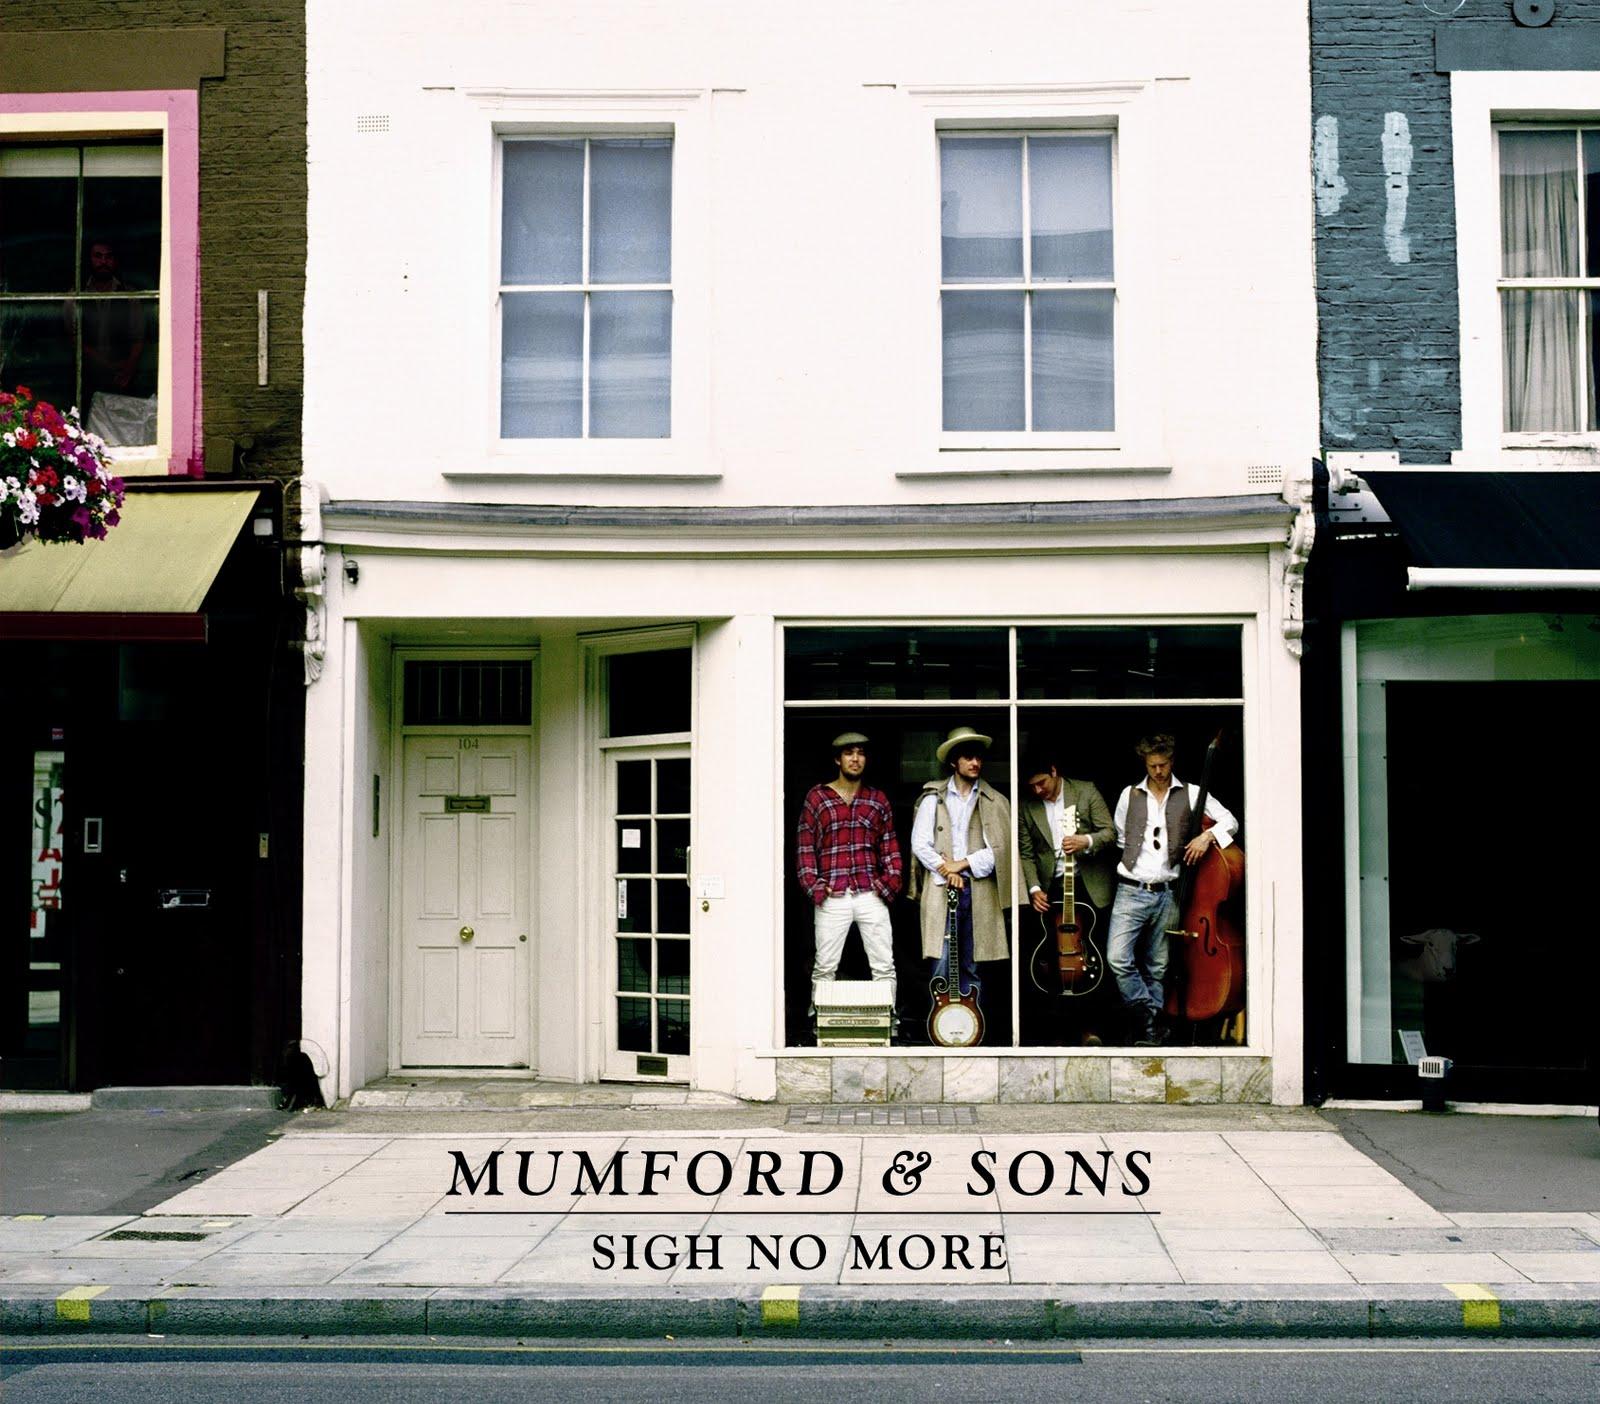 http://4.bp.blogspot.com/-qVRlQ-0XHyM/TaDbZY2WHxI/AAAAAAAABco/nj49NJ2_L8w/s1600/Mumford-Sons-Sigh-No-More.jpg